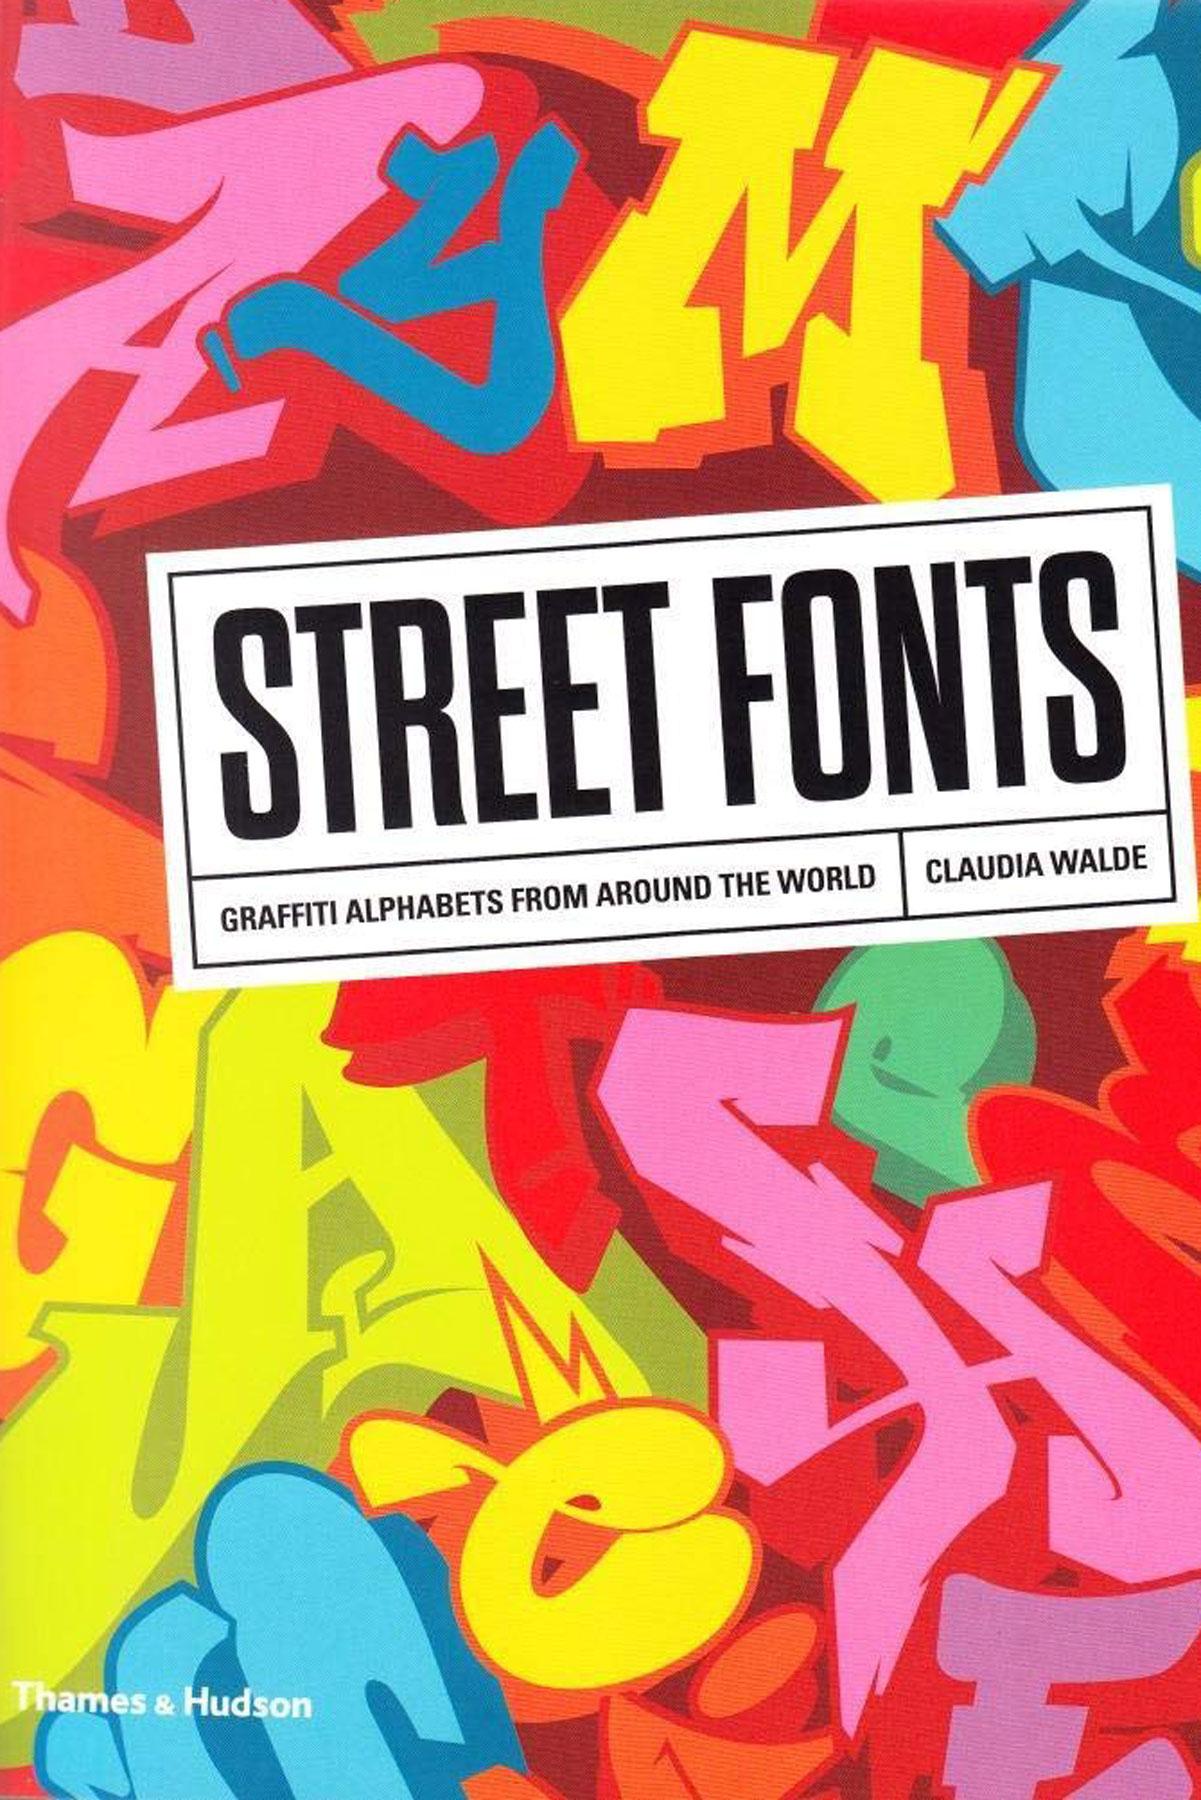 STREET FONTS - Graffiti Alphabets di Claudia Walde